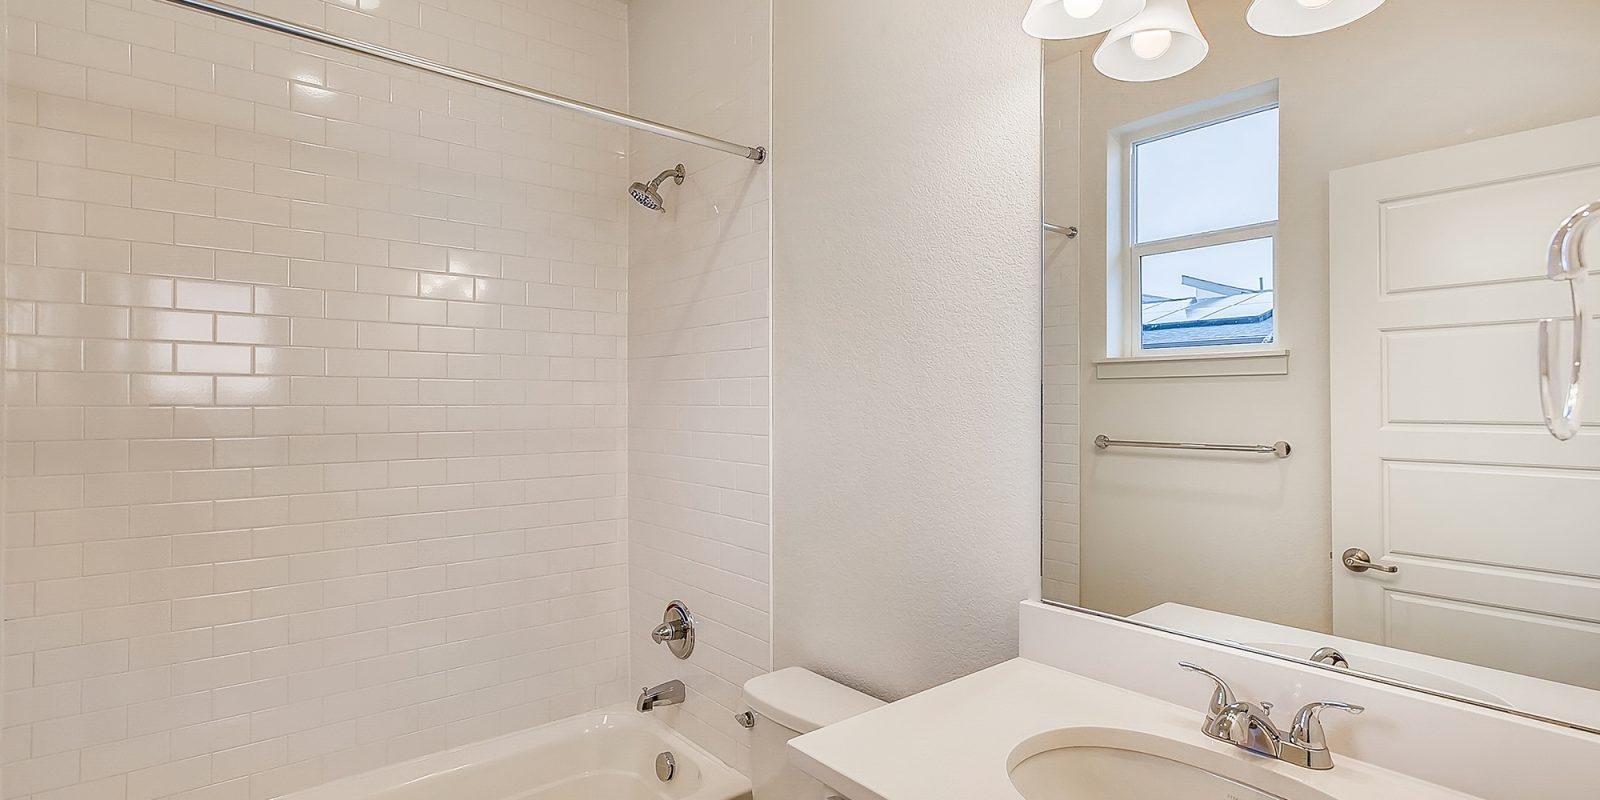 WestRidge DoMore Rows: Oasis - Secondary Bathroom